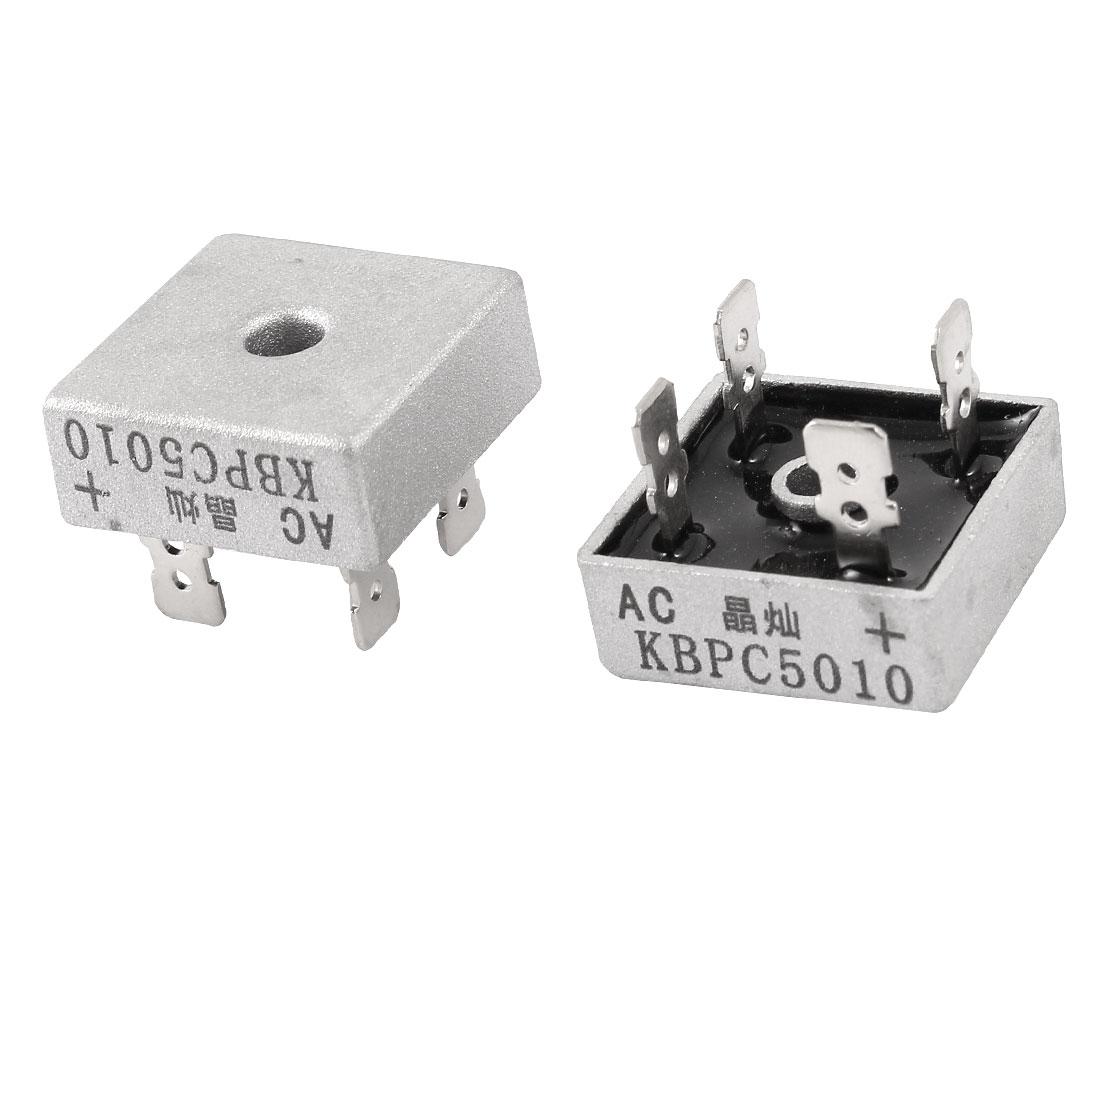 2 Pieces Metal Case KBPC5010 1000V 50A Single Phase Bridge Rectifier